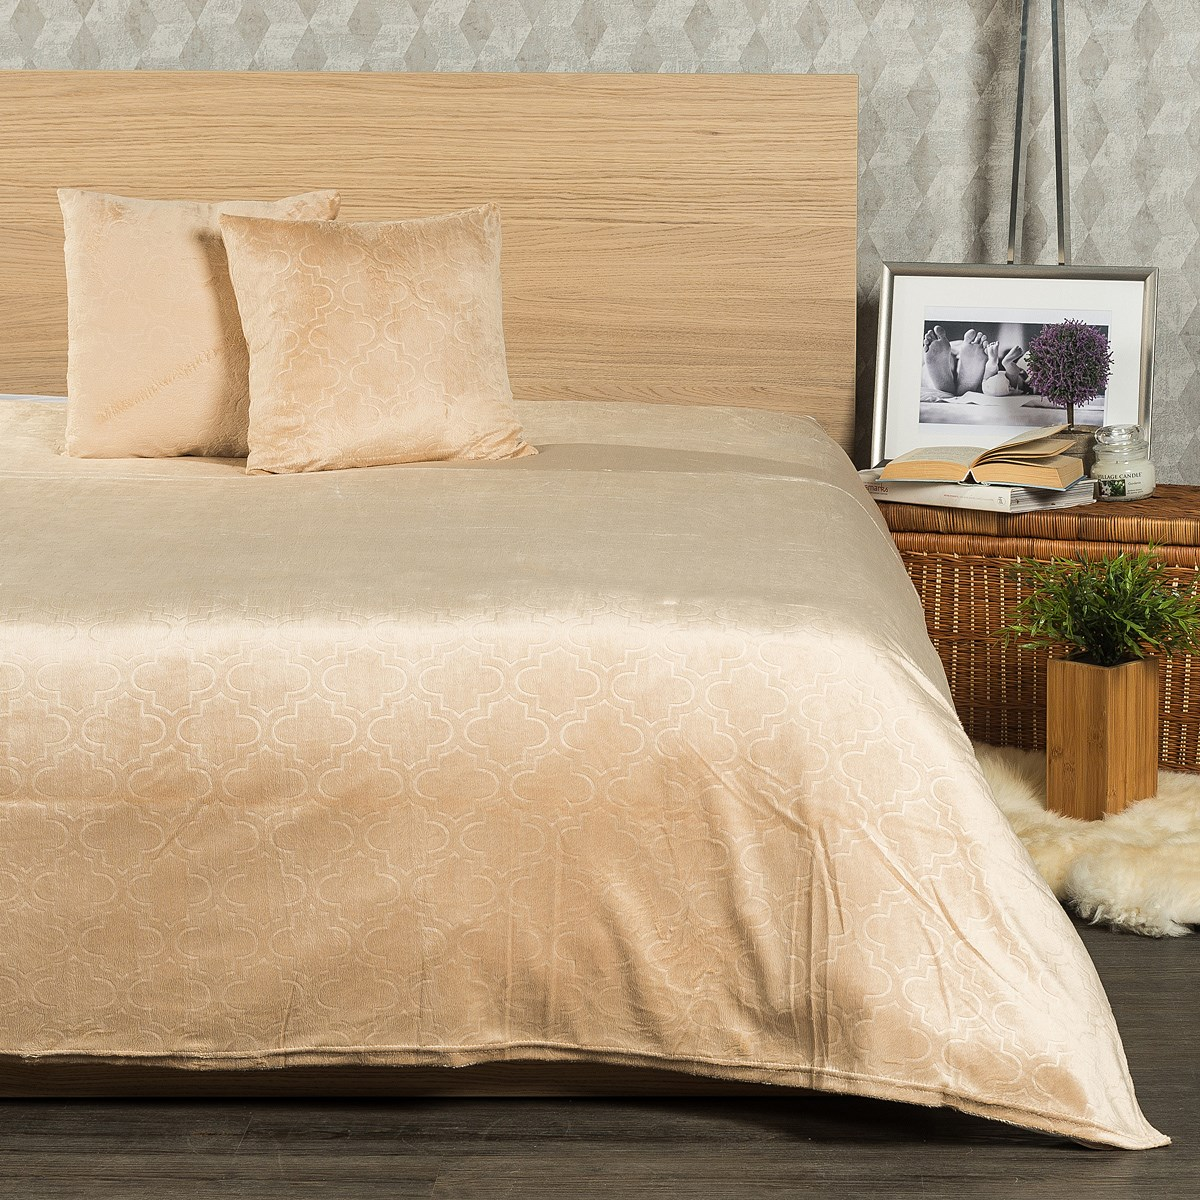 4home gytakar salazar b zs sz n 220 x 240 cm 2x 40x40 cm lakberendez s. Black Bedroom Furniture Sets. Home Design Ideas